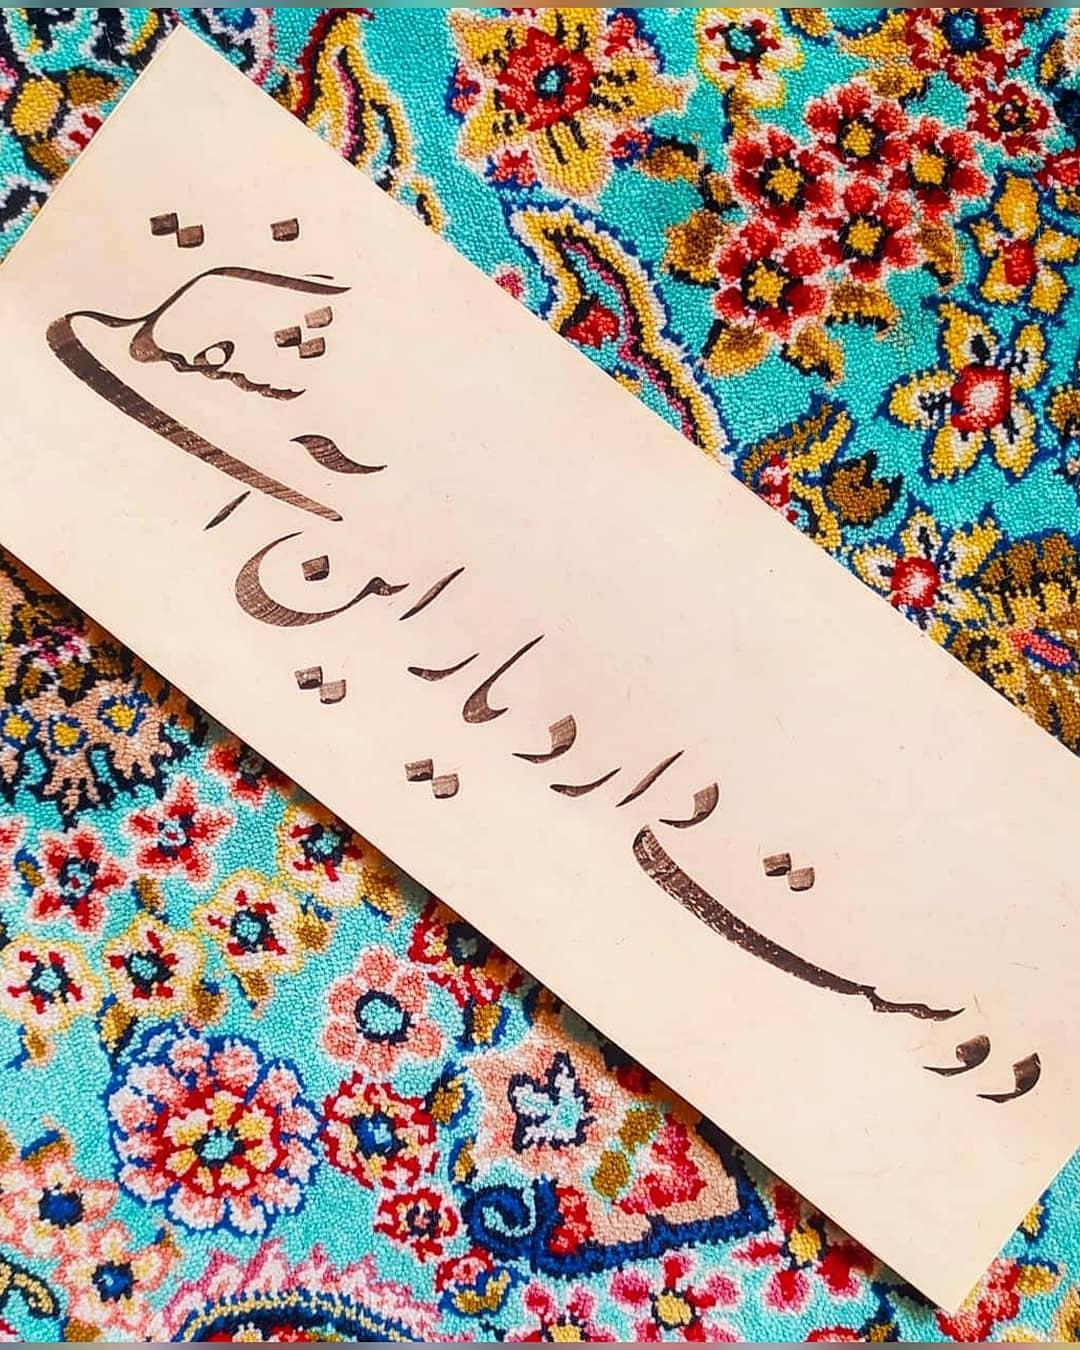 Farisi/Nasta'liq khatestan  ﷽ دوست دارد یار این آشفتگی  . #خطستان  @khatestan #خوشنویسی_مدرن#خوشنویسی_با_قل… 646